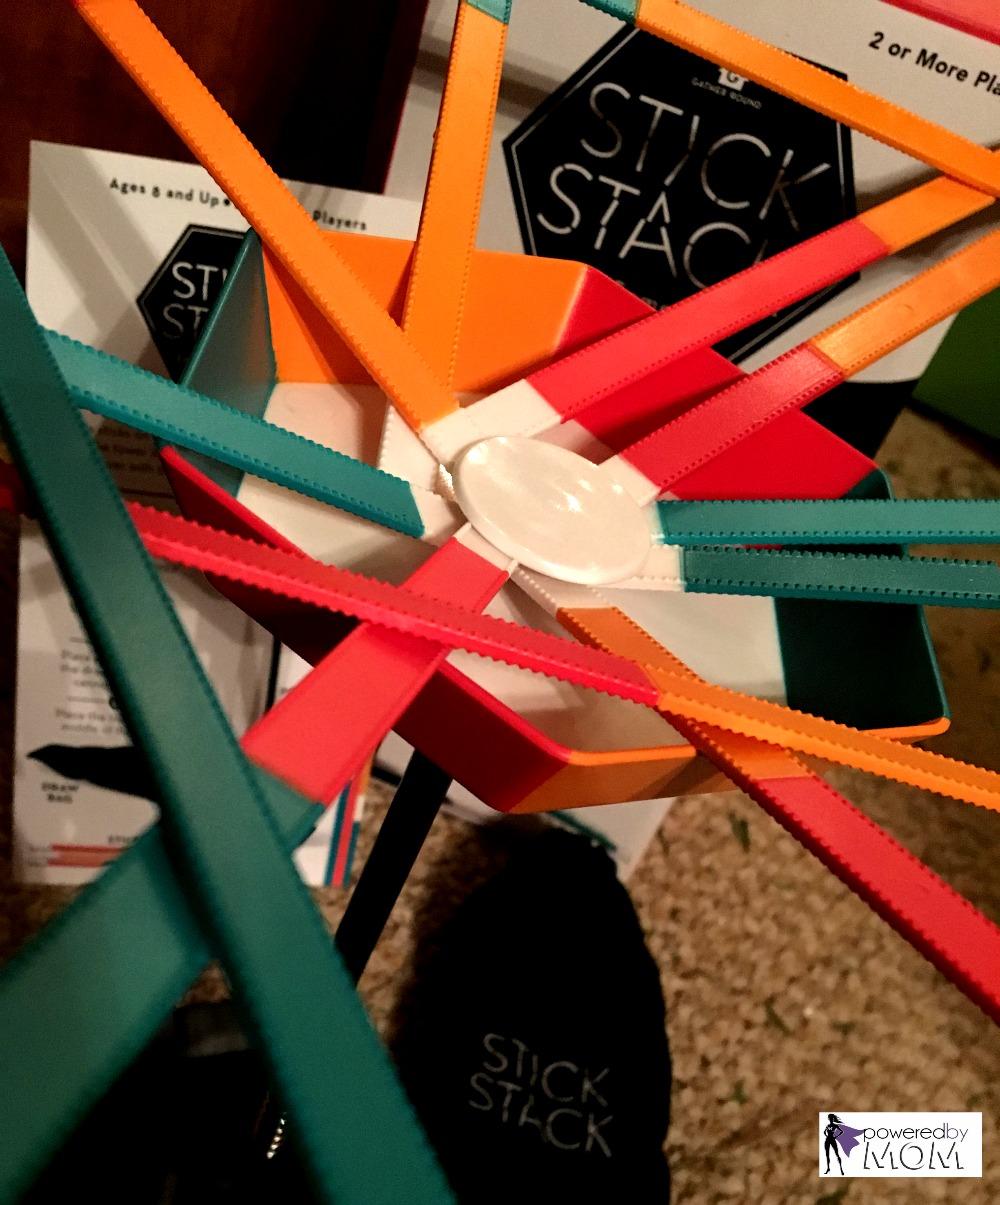 stick-stack